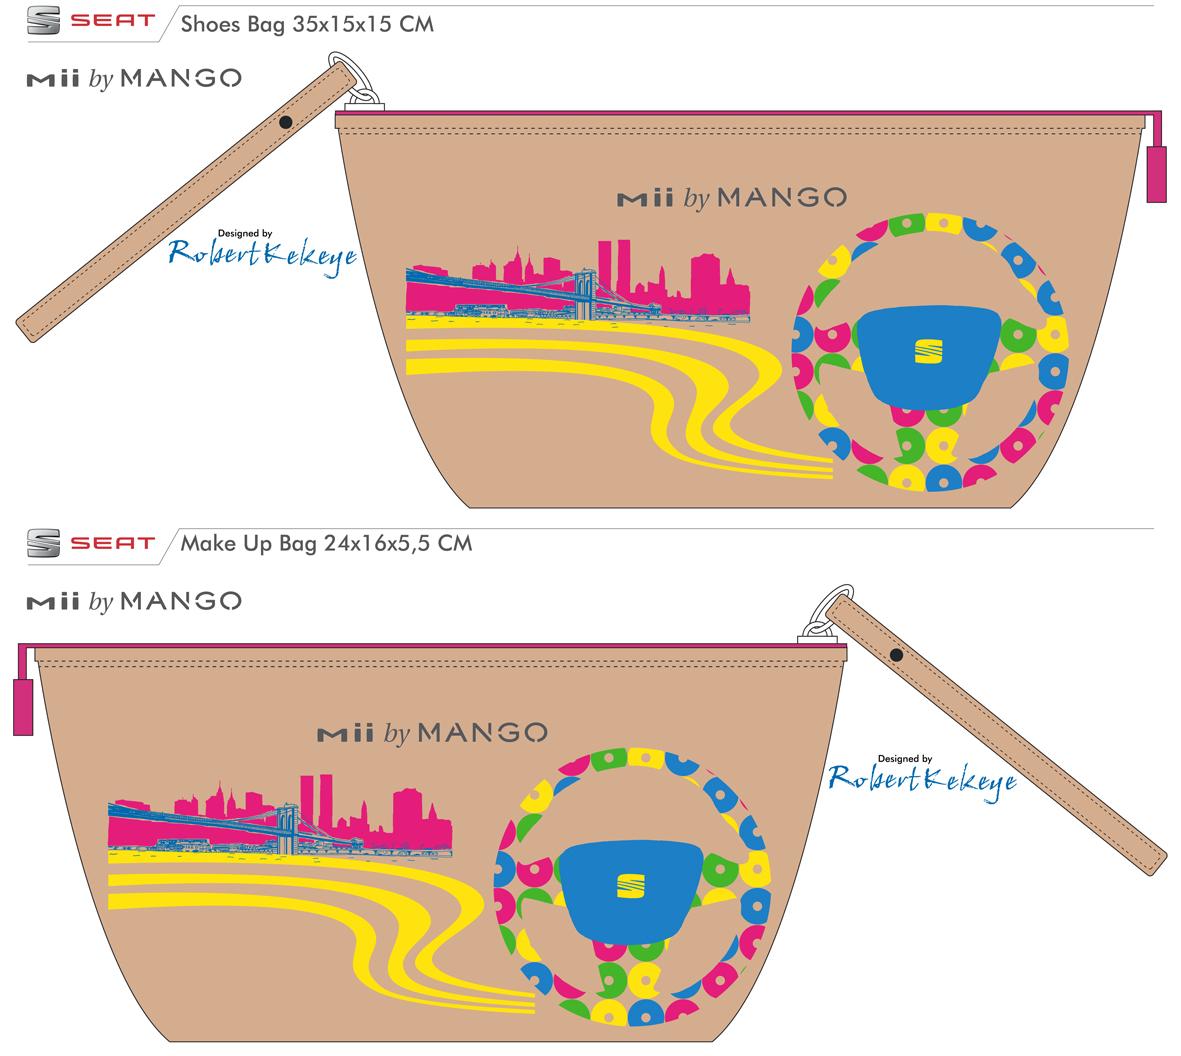 Seat Mii by MANGO, Make Up and Shoes Bag designed by © Kekeye